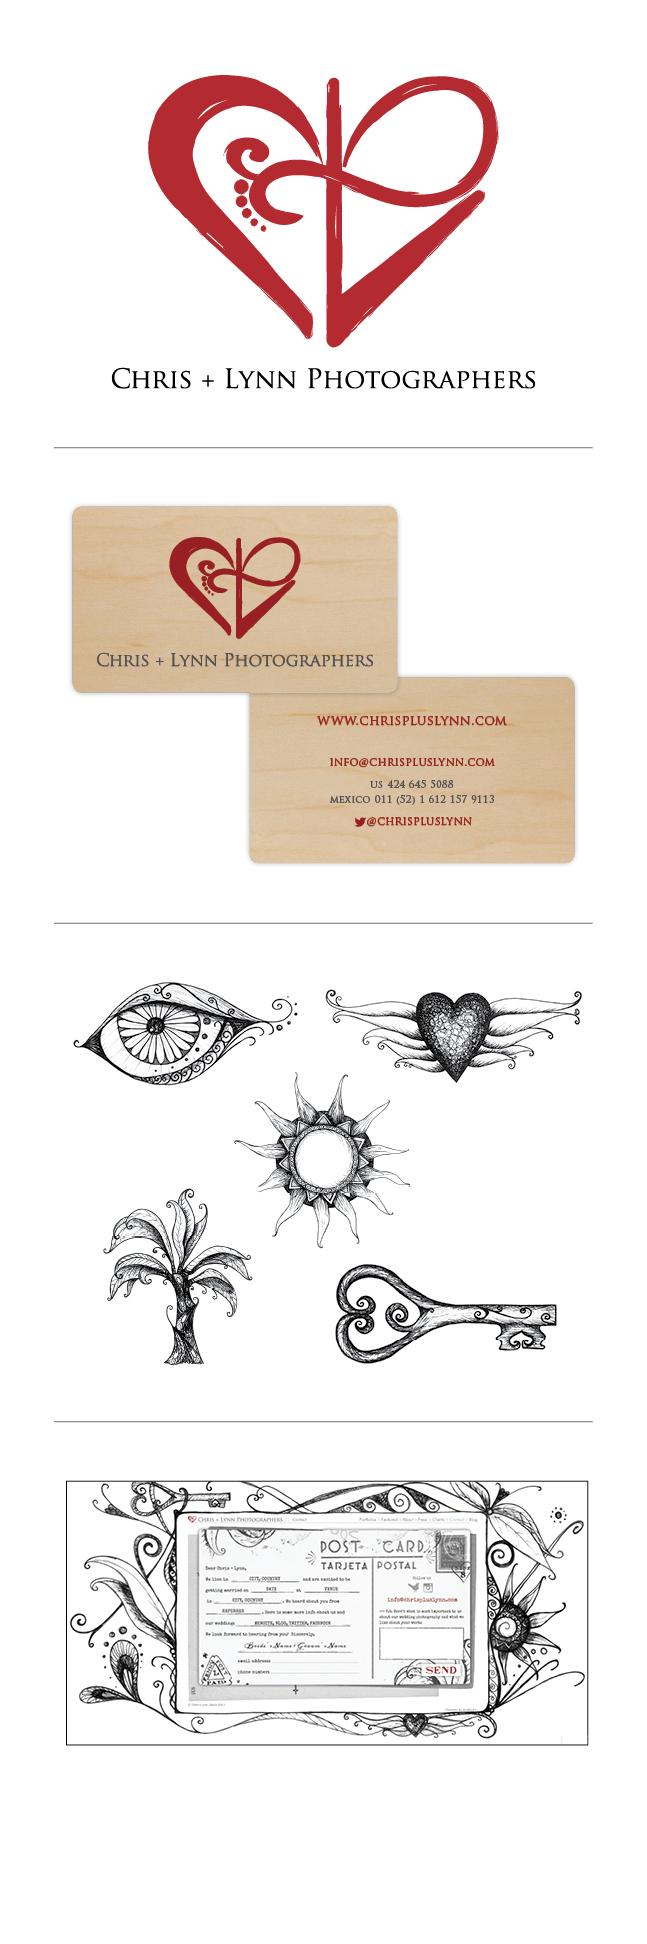 Chris + Lynn Project